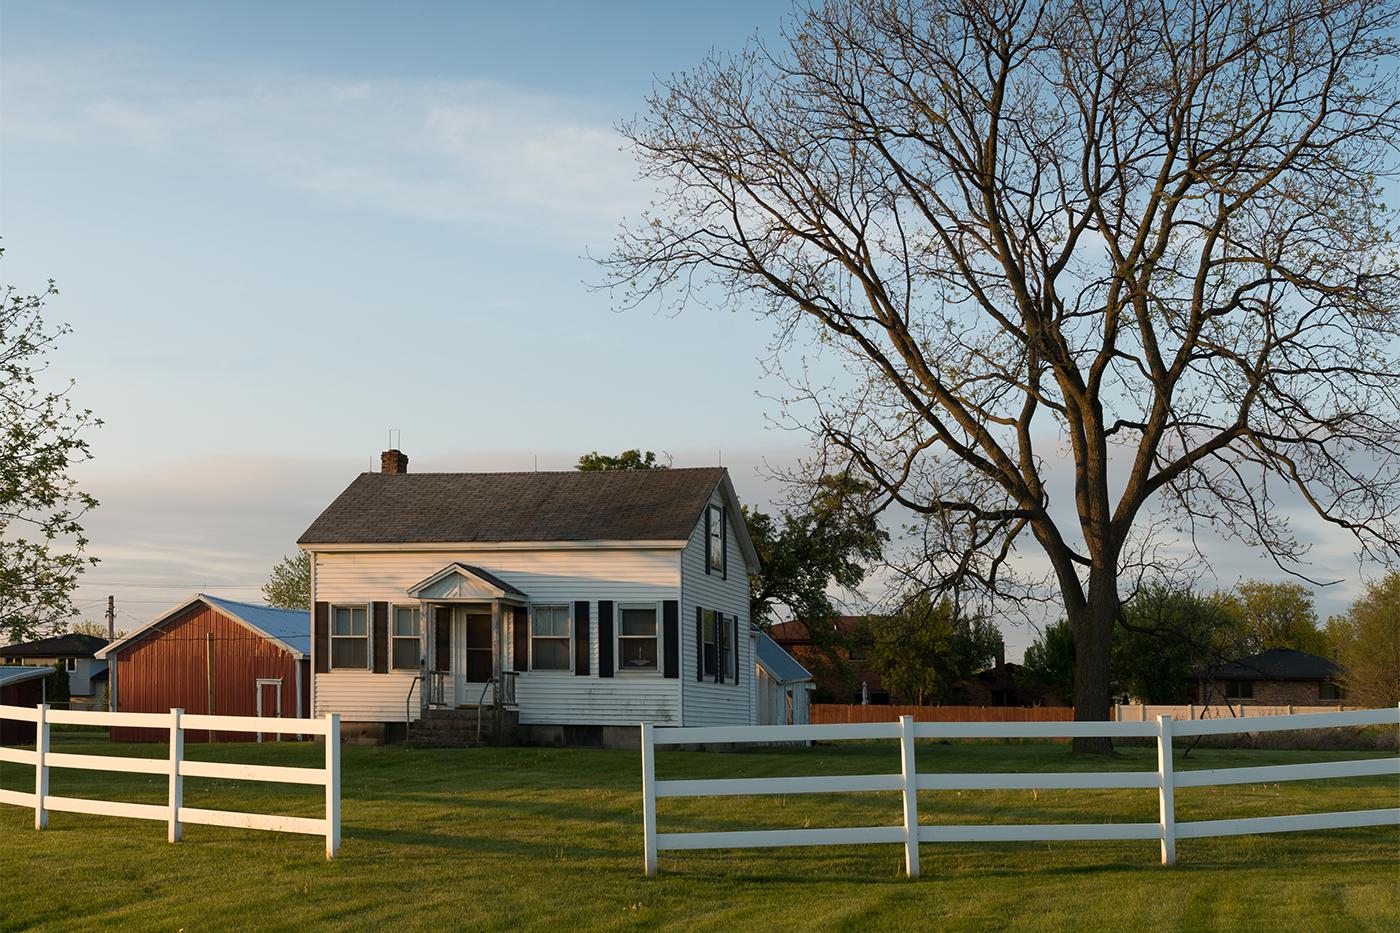 farm house in rural setting